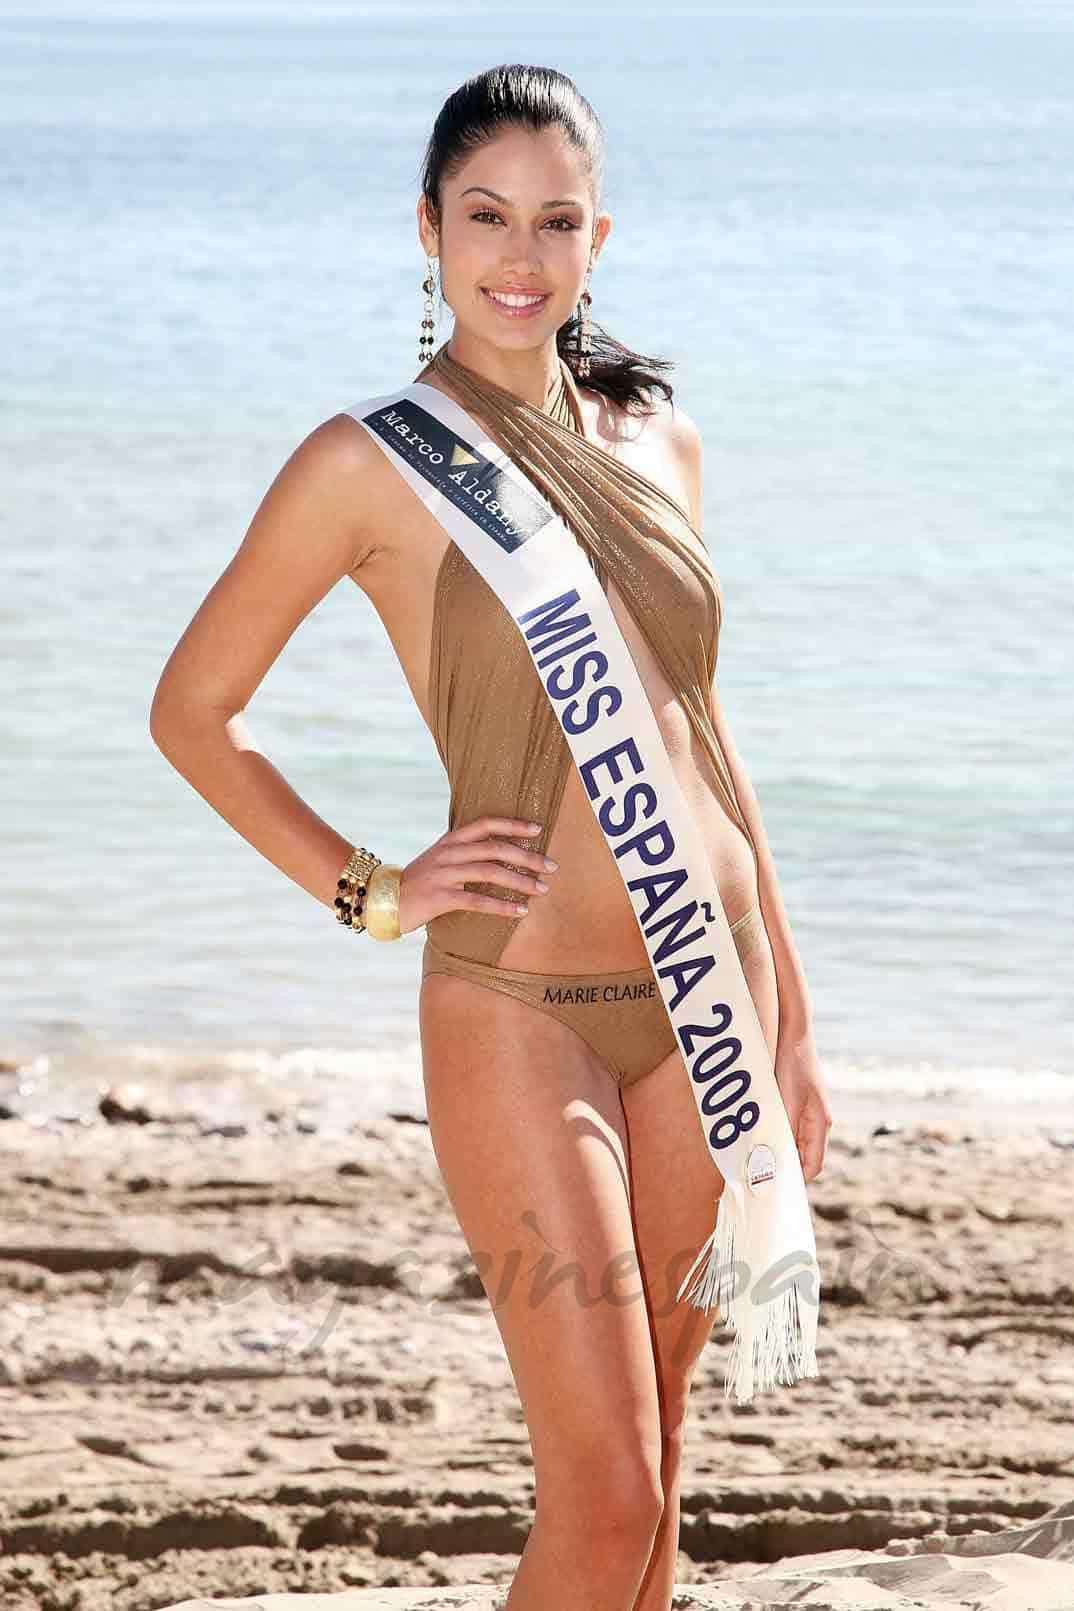 patricia yurena rodriguez, miss espana 2008/2013, 1st runner-up de miss universe 2013. - Página 4 Patric17